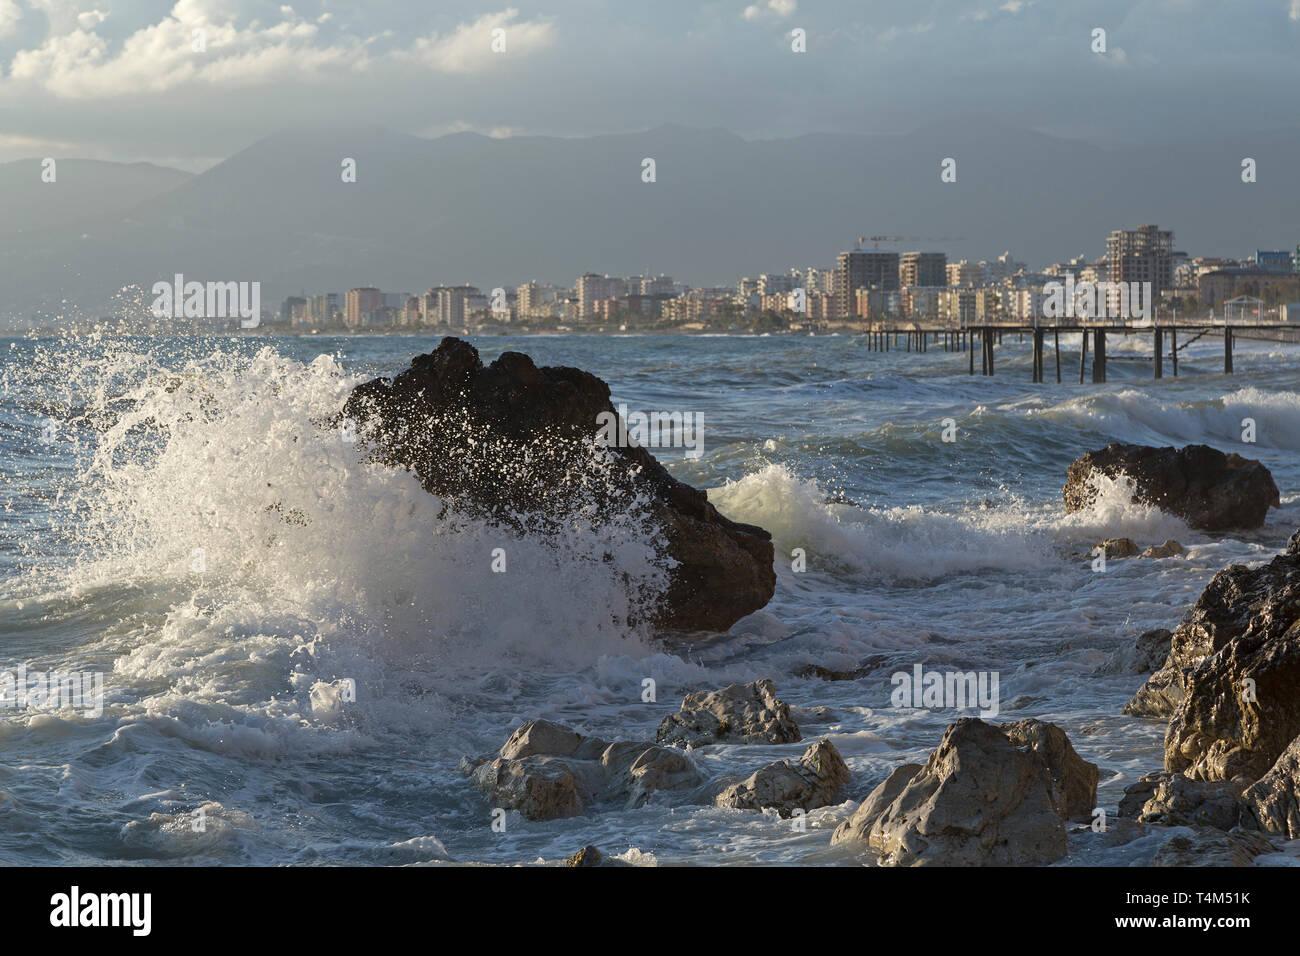 swell at the seafront of Kargicak, Alanya, Province Antalya, Turkey - Stock Image